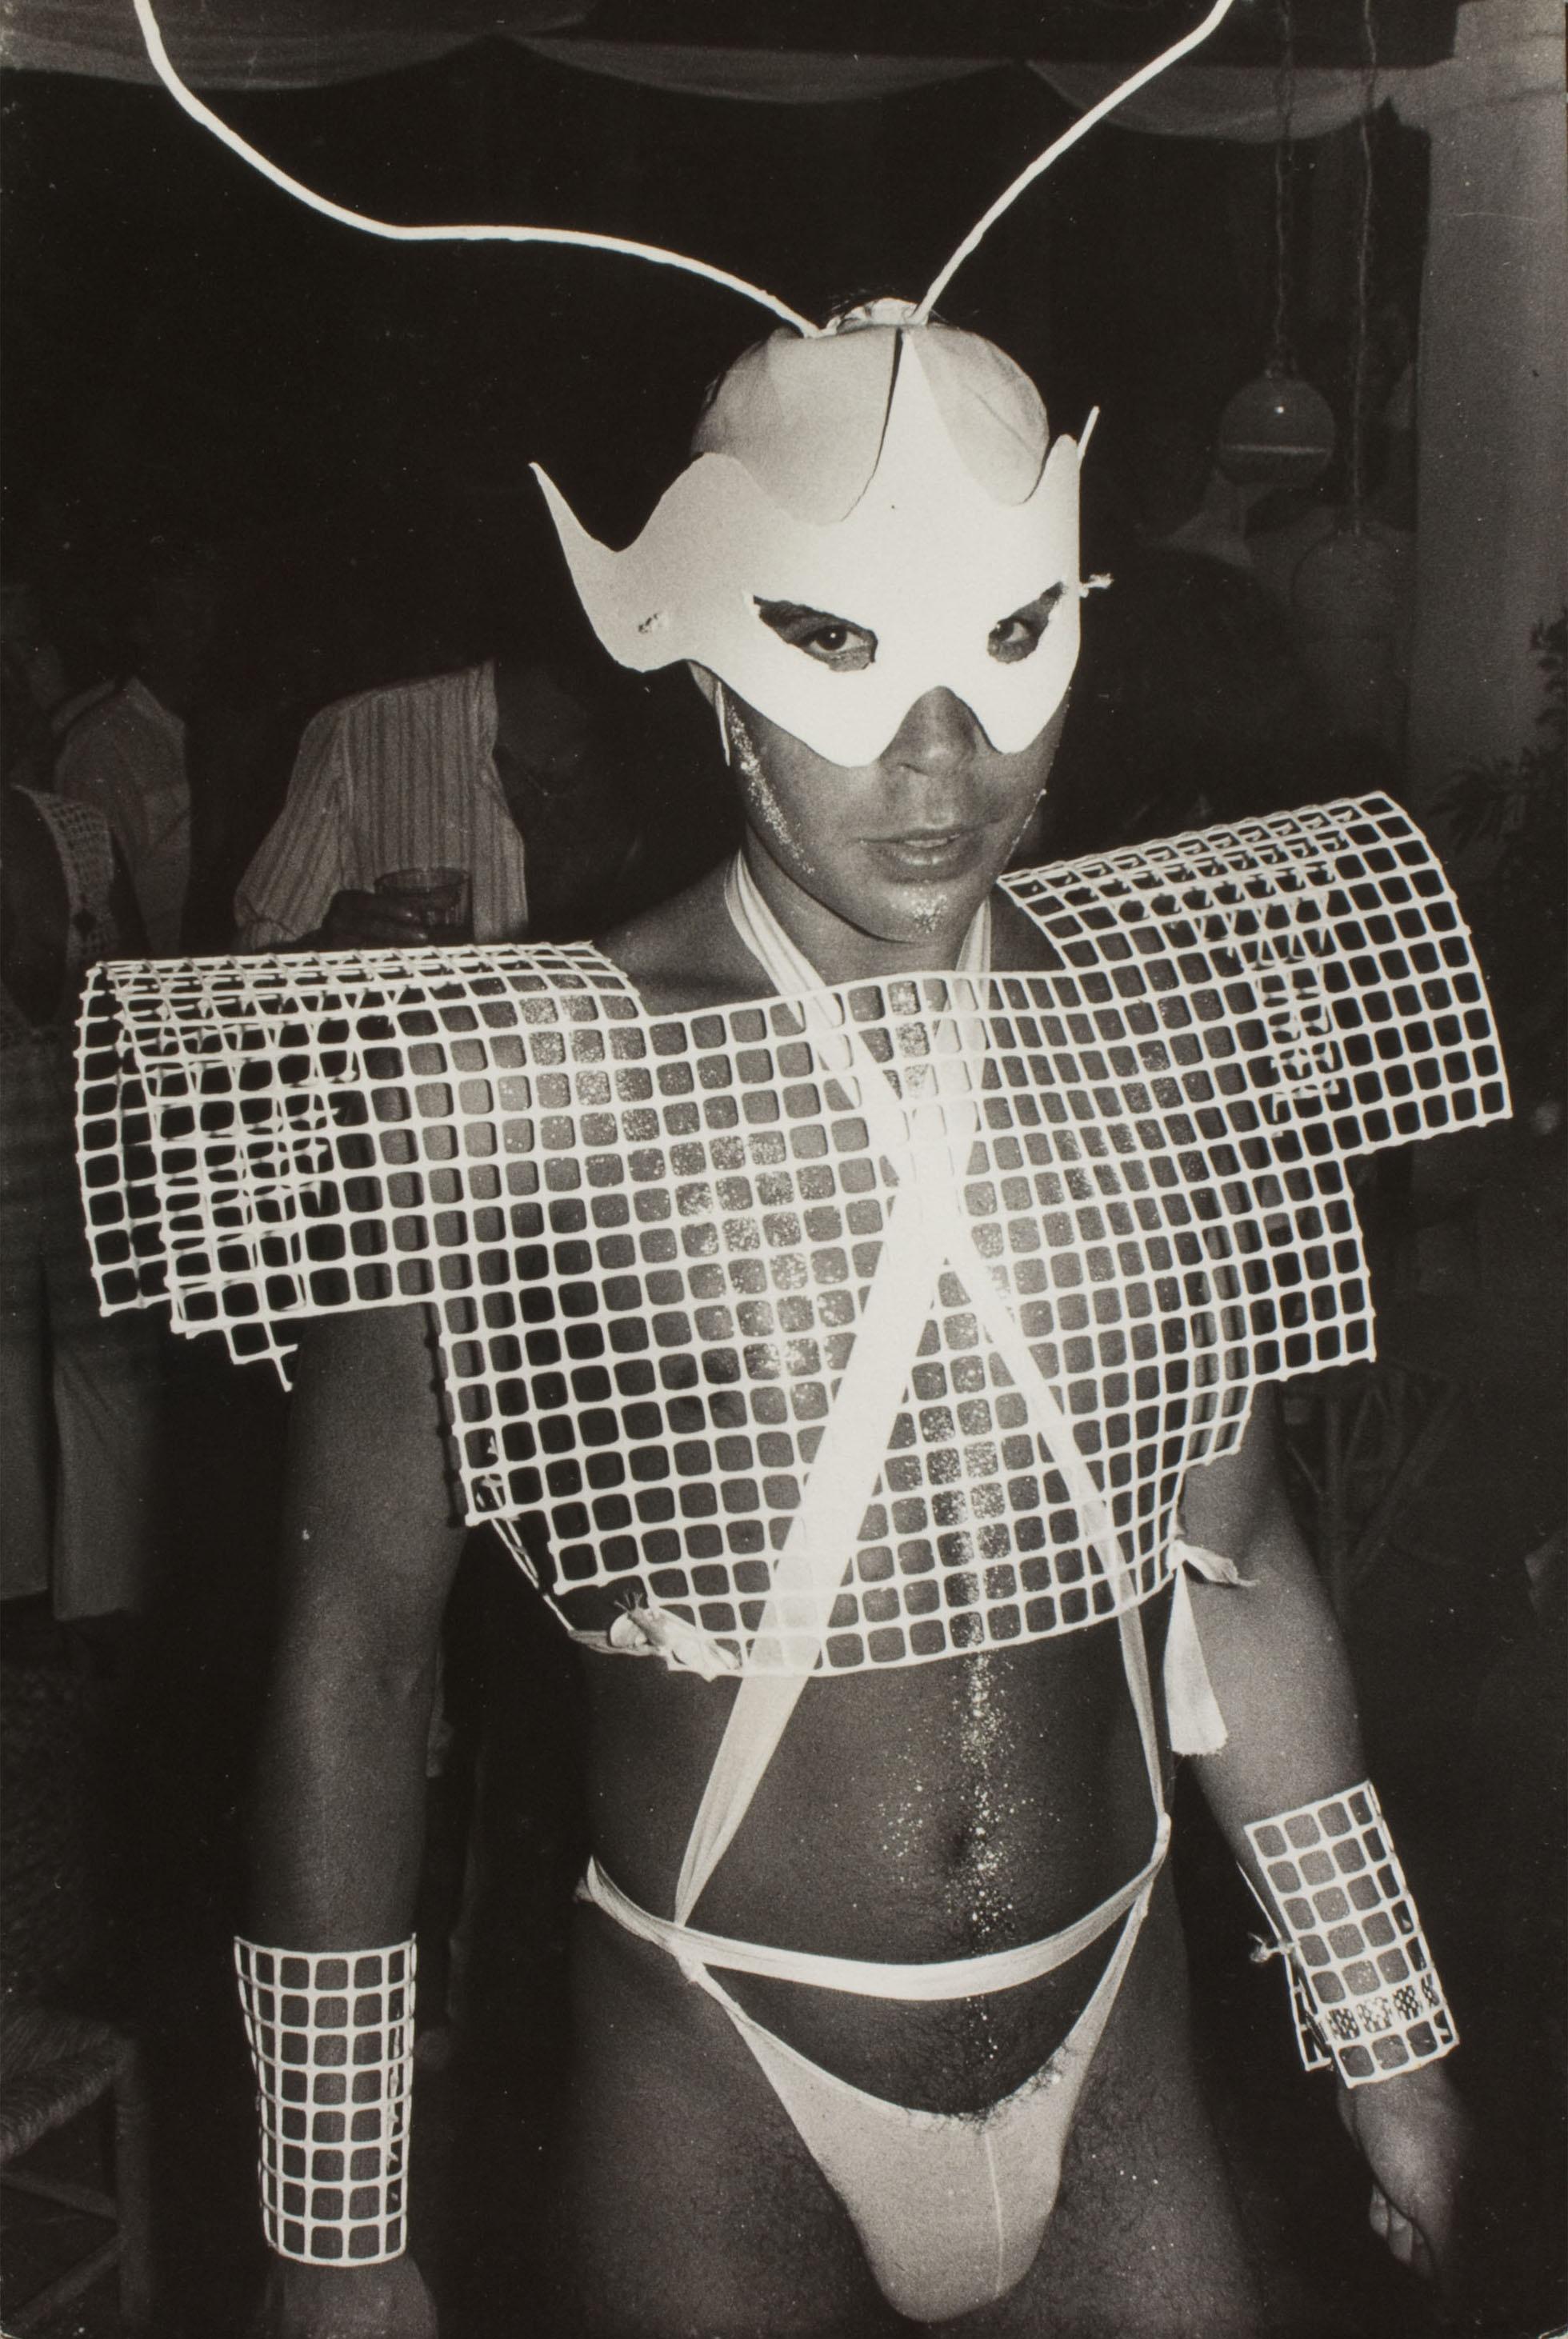 Oriol Maspons - Sense títol (Eivissa) - Cap a 1976-1980